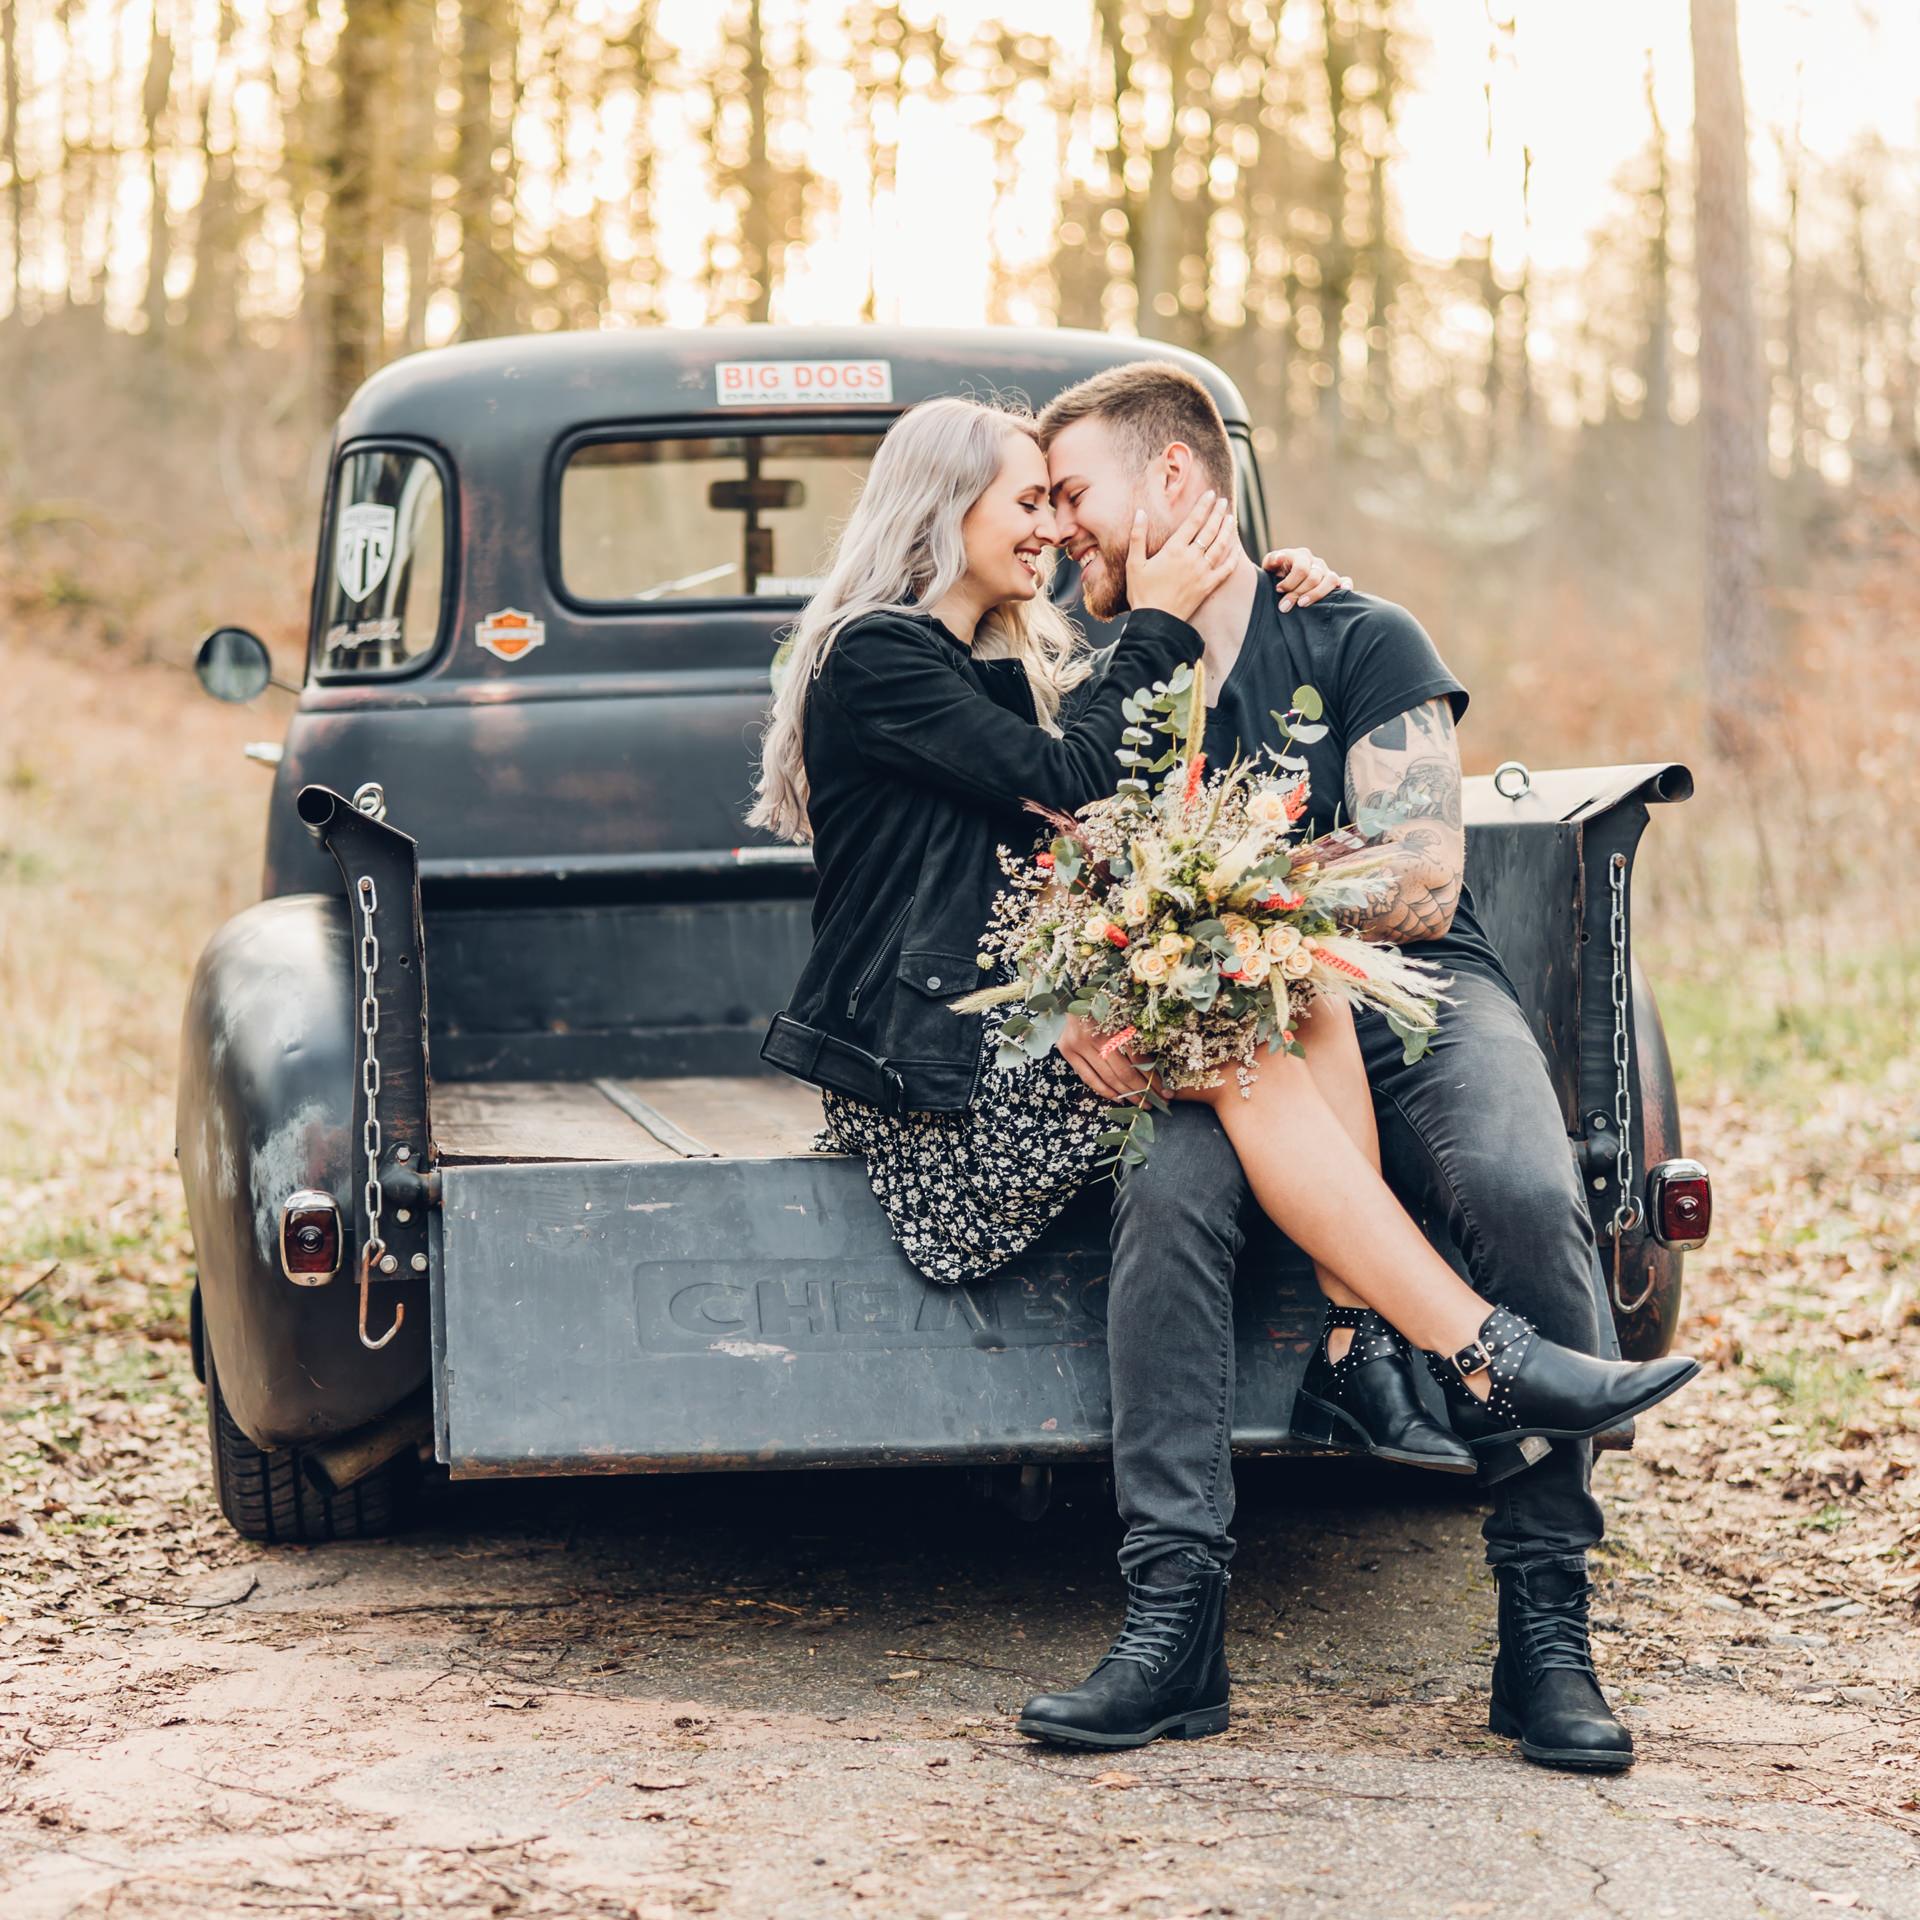 Pärchenfotos mit Oldtimer Chevrolet Pickup Rat Rod